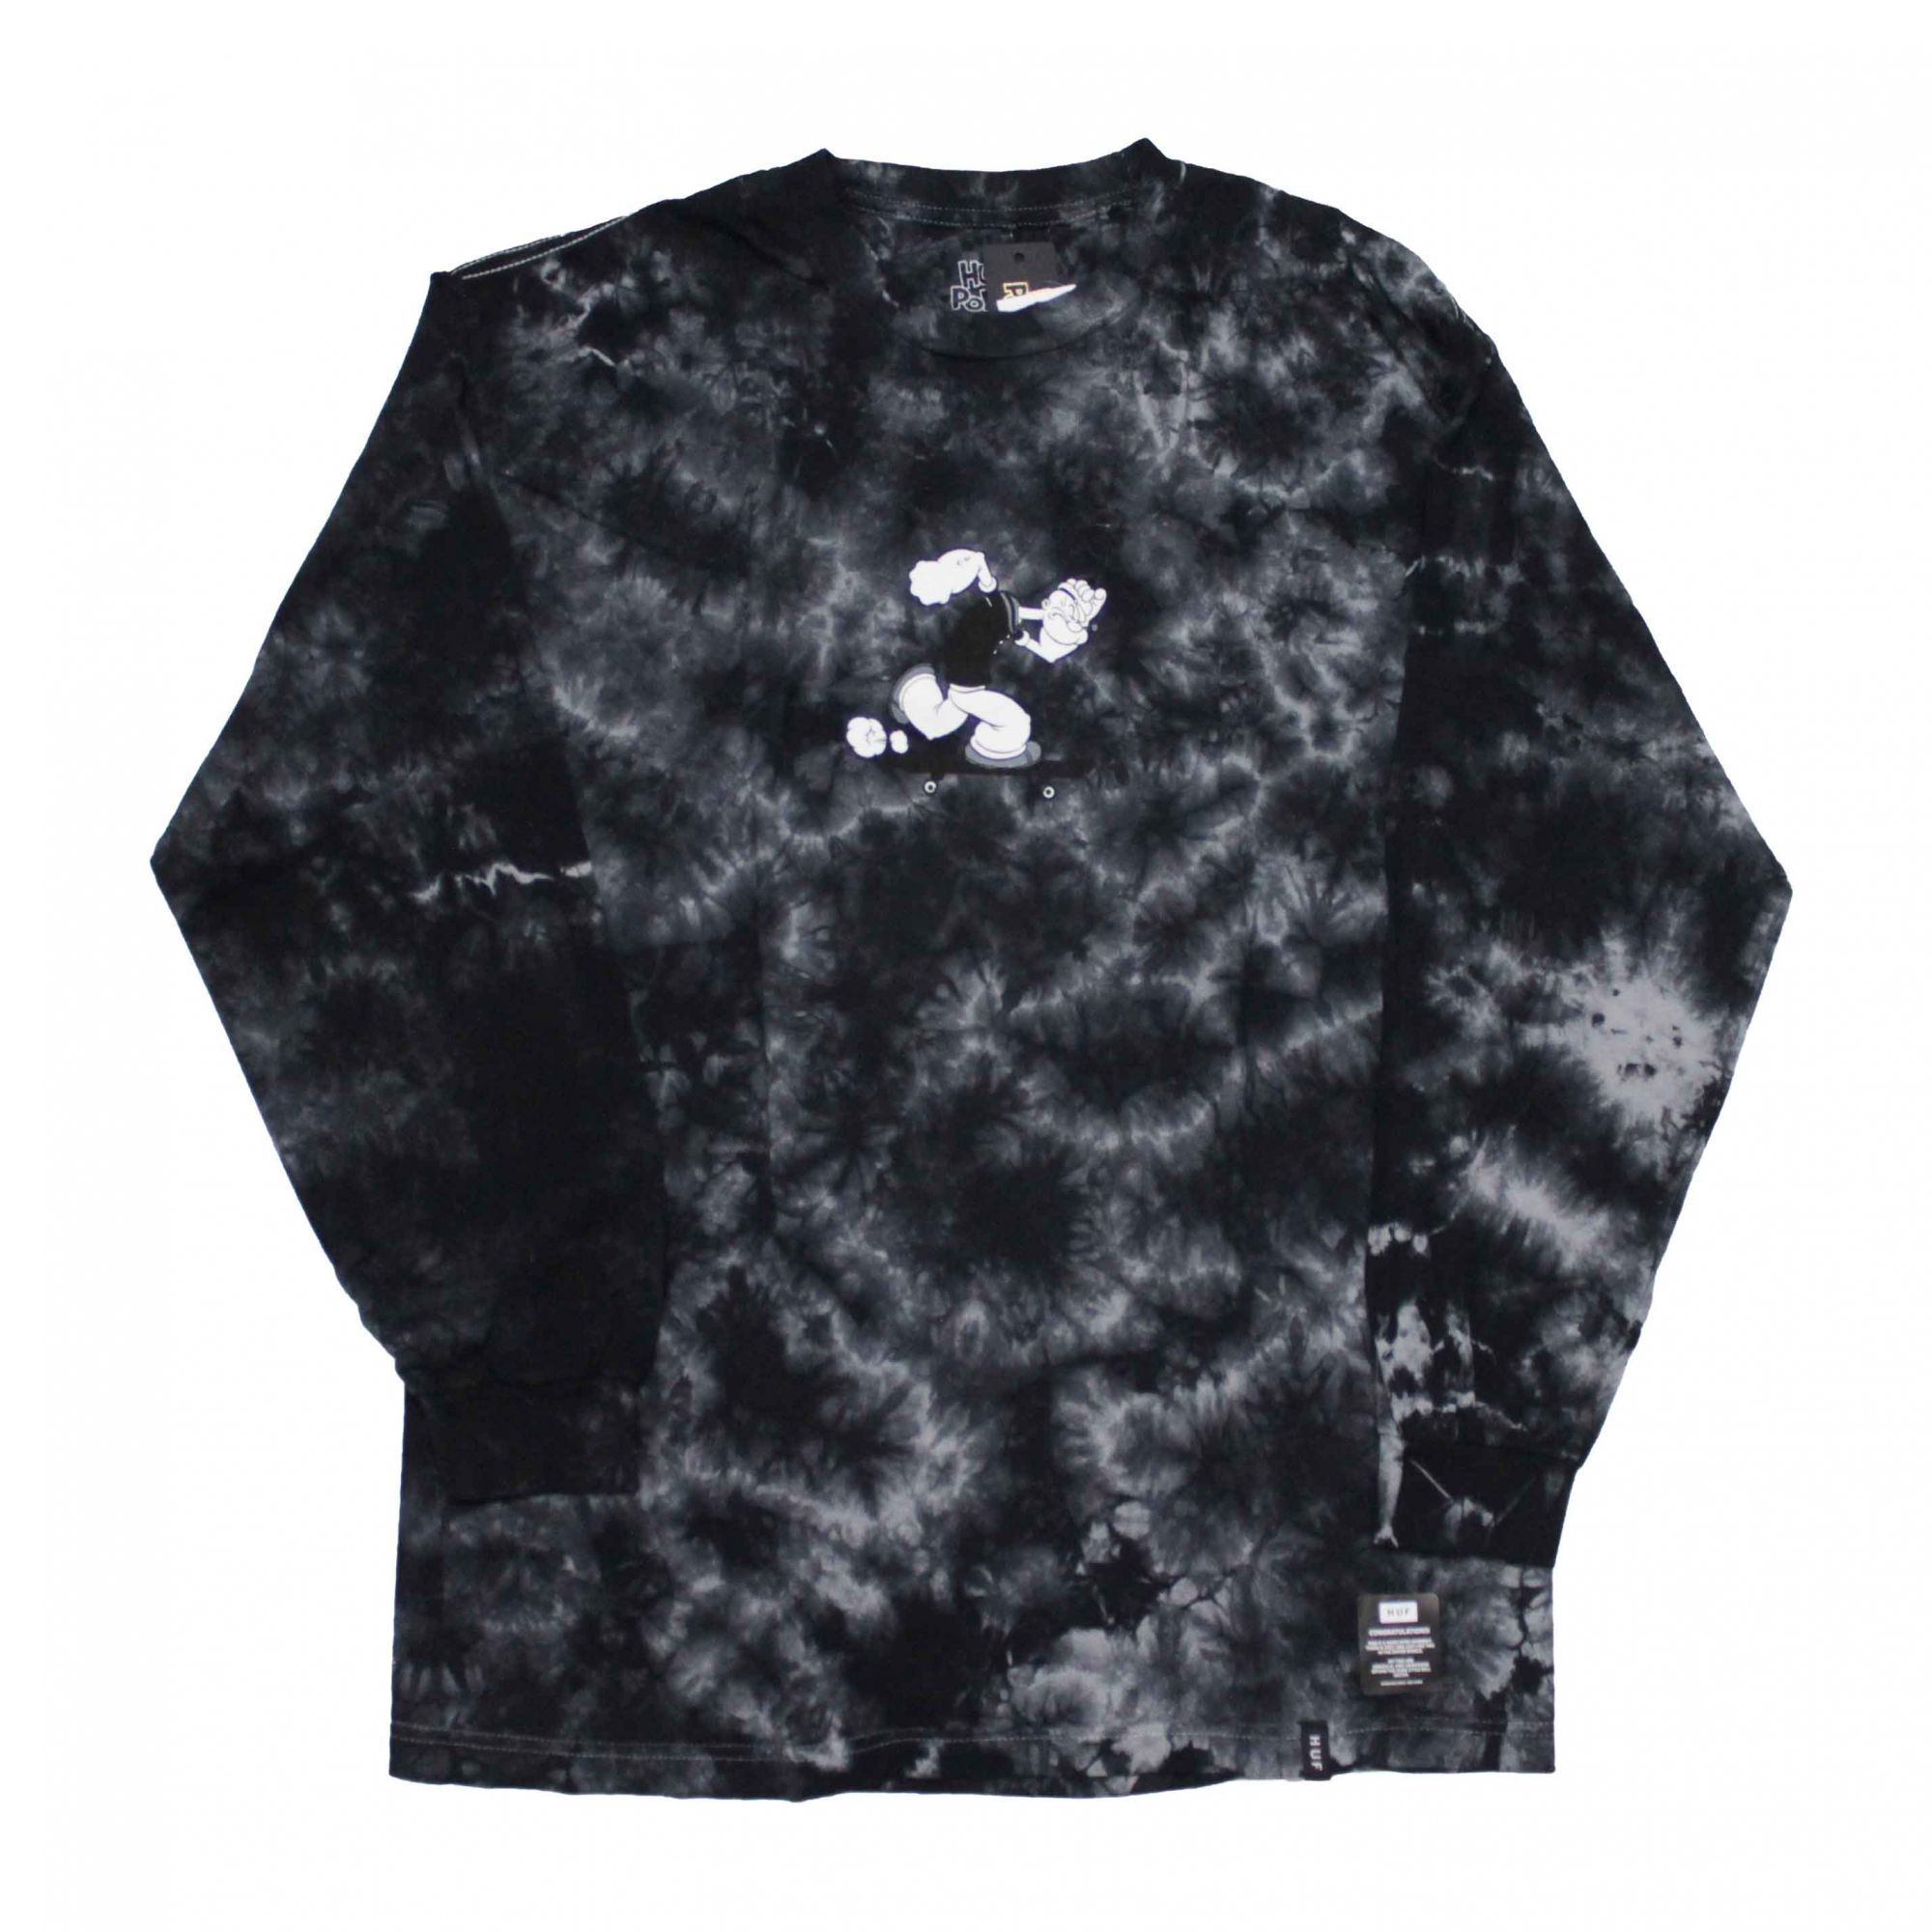 Camiseta Manga Longa HUF x Popeye Skates Tie Dye Preto (Importado)